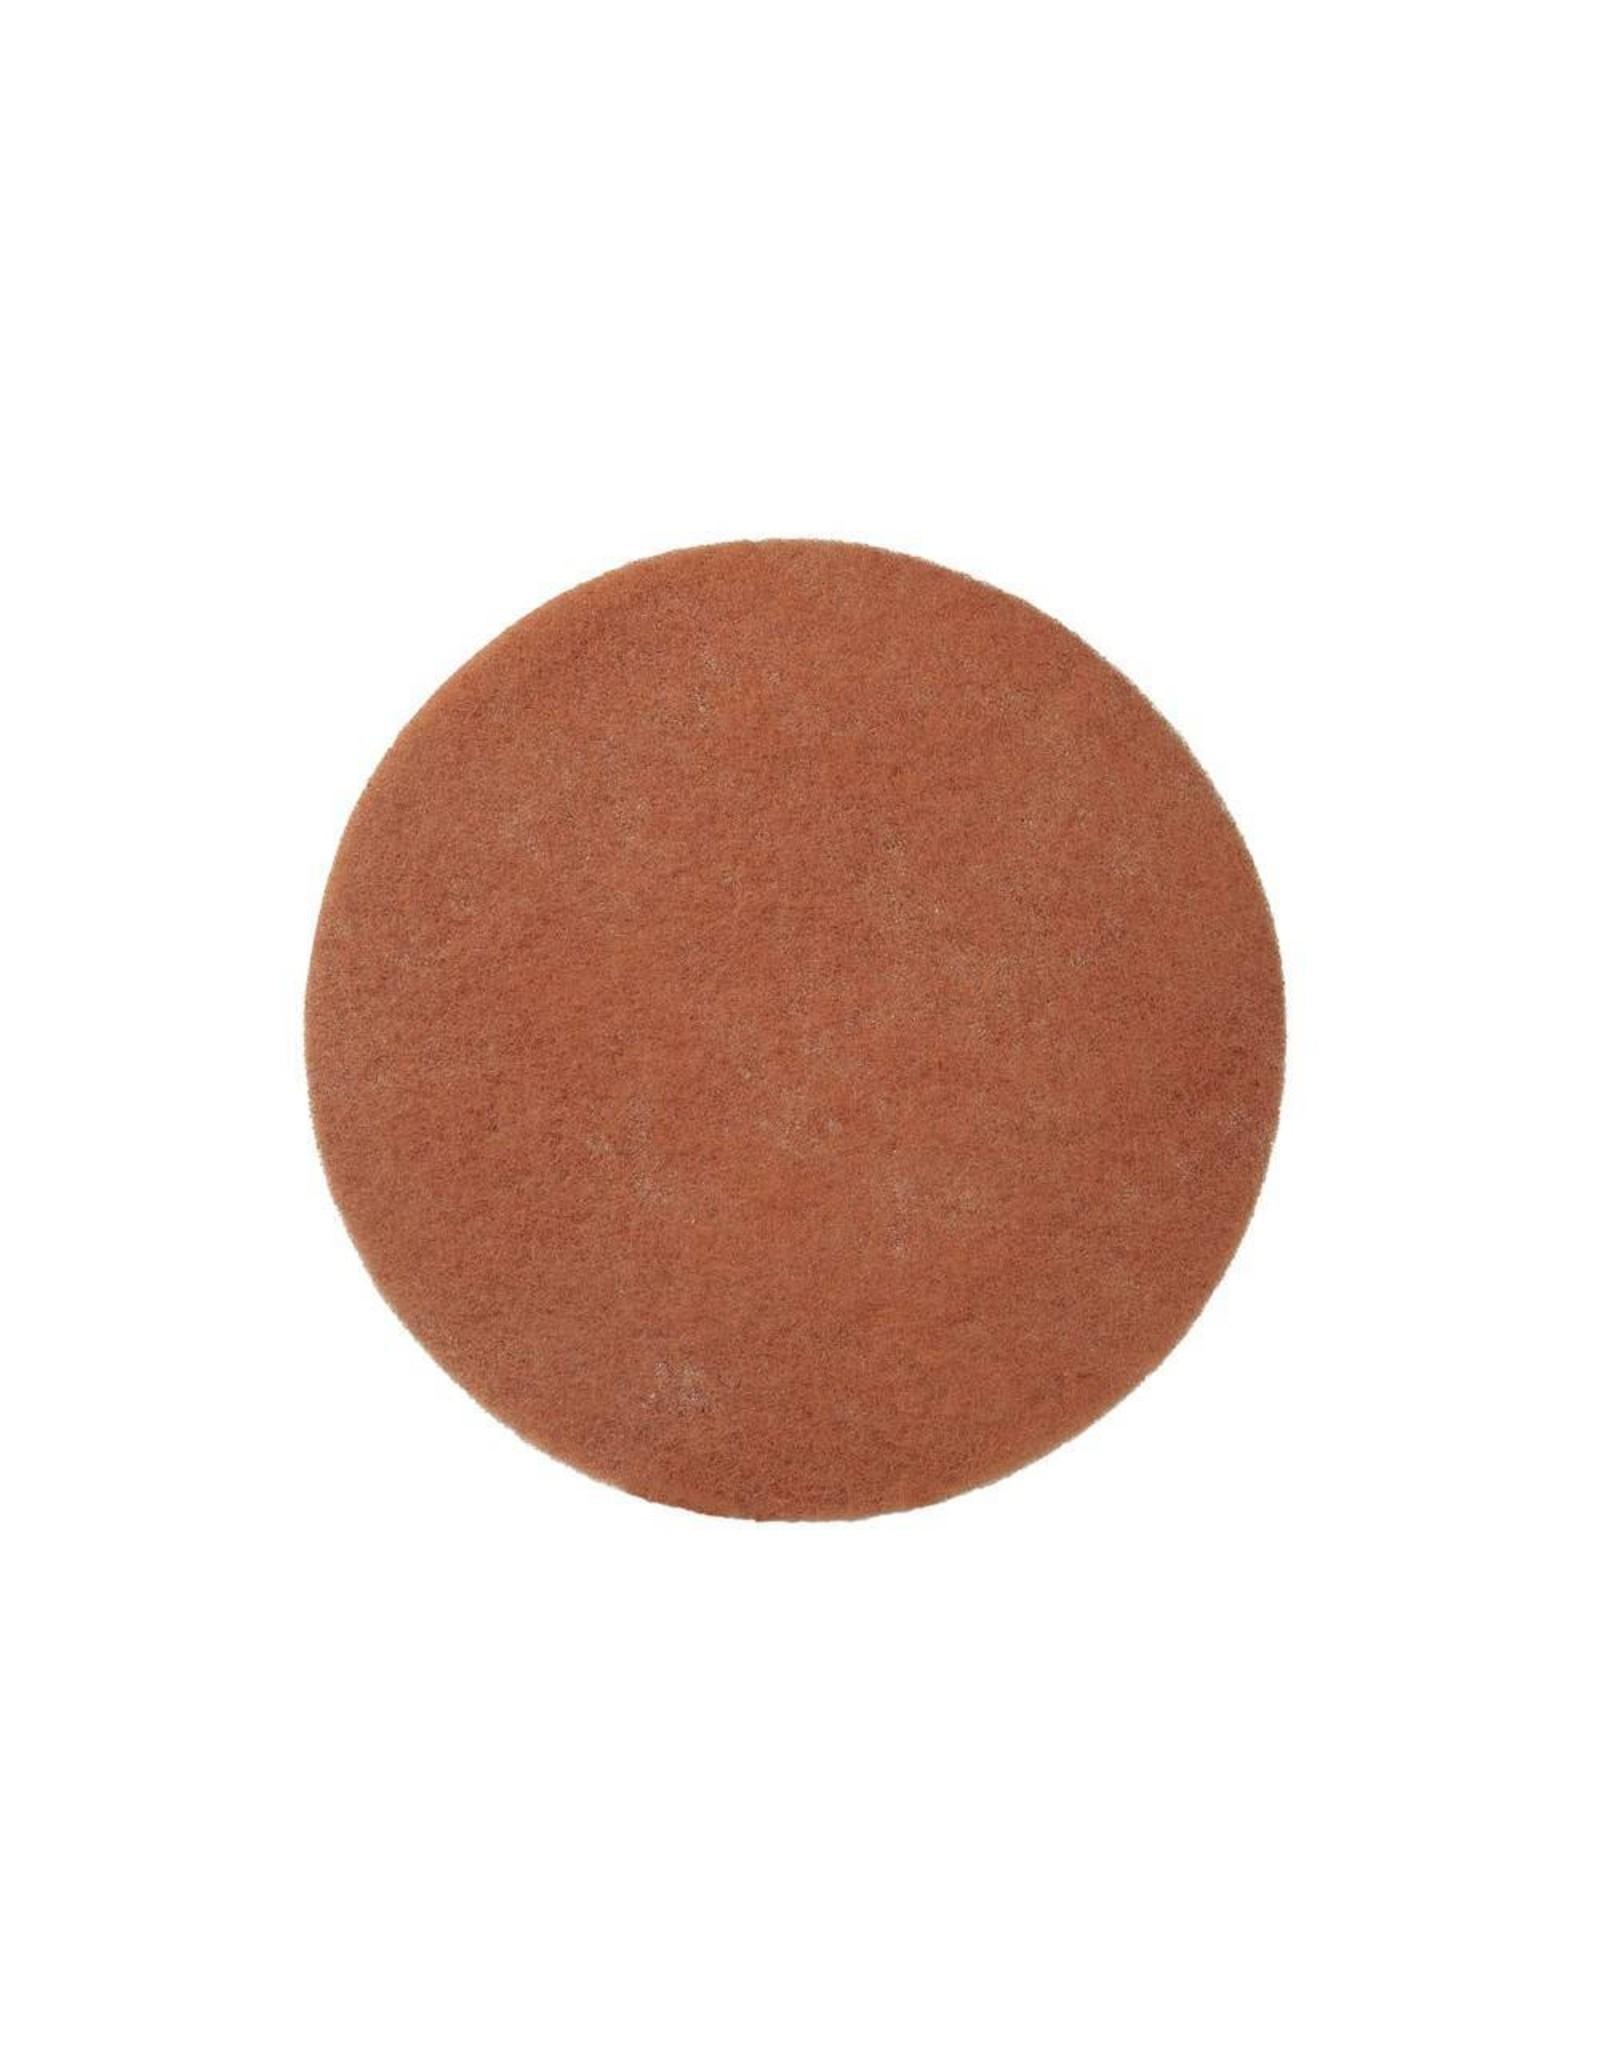 ACOR Nylon Pads Beige - 40 CM, 2 CM, 16 inch (High Quality)